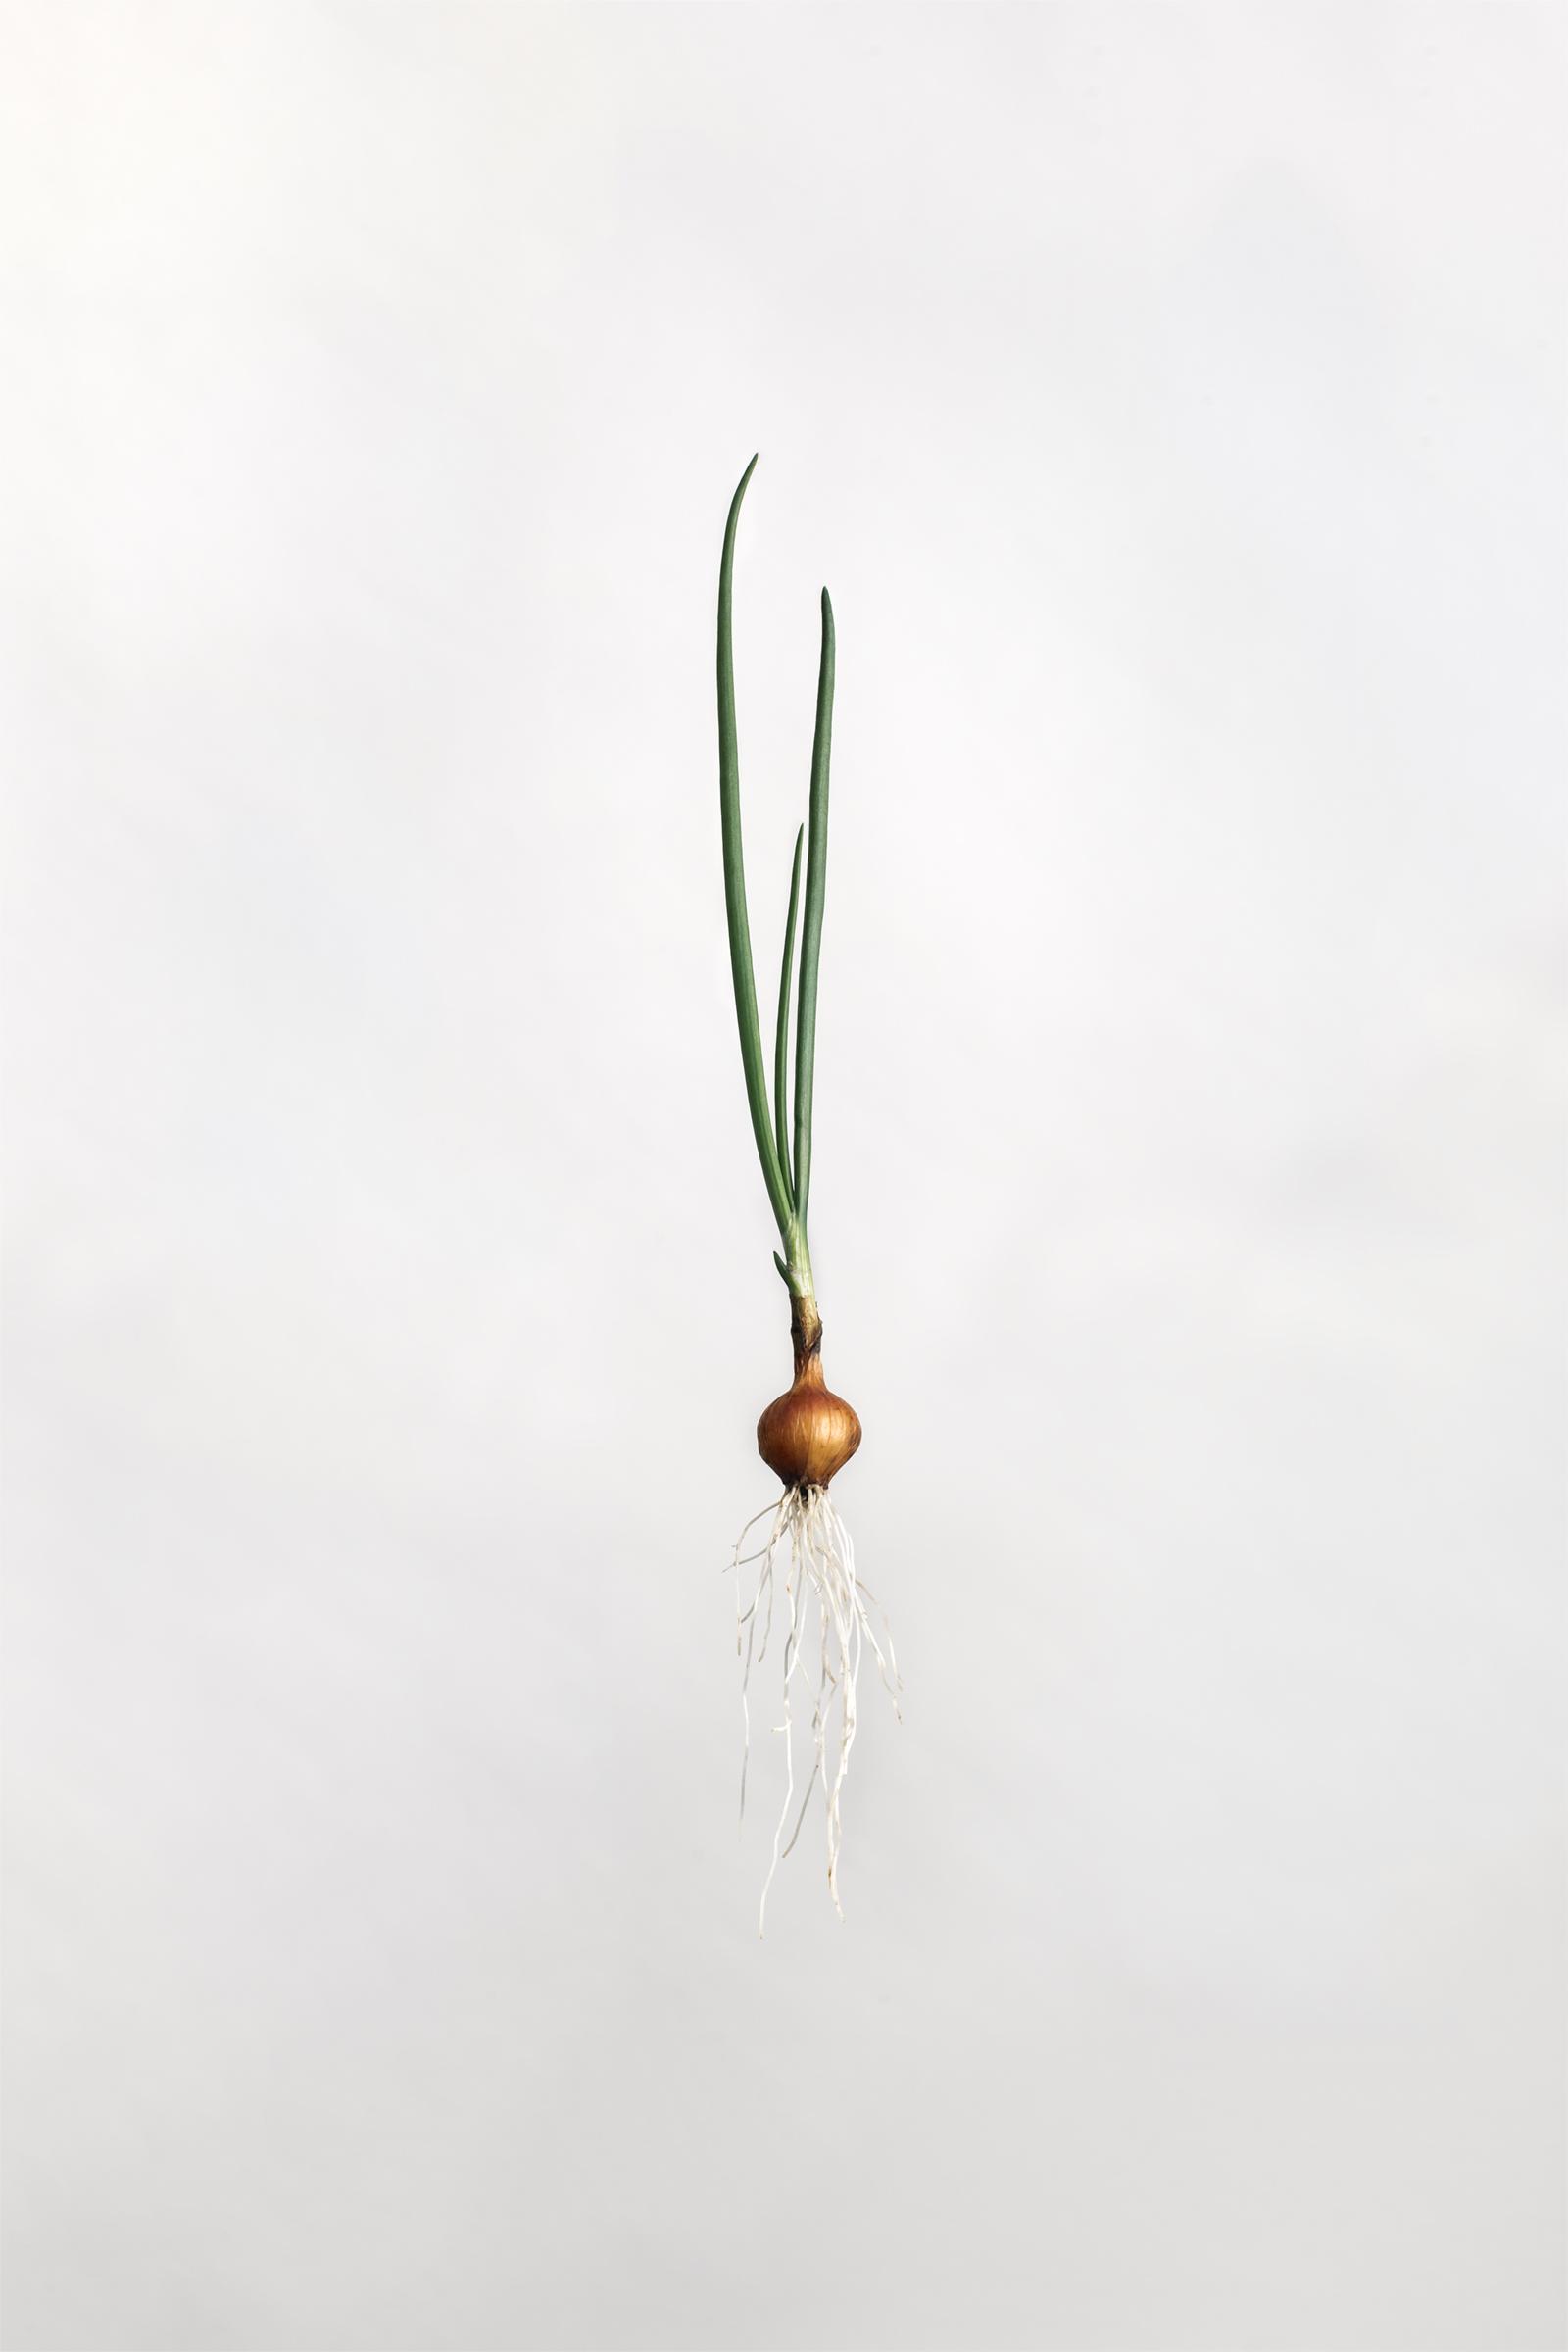 Allium cepa - Yellow Onion